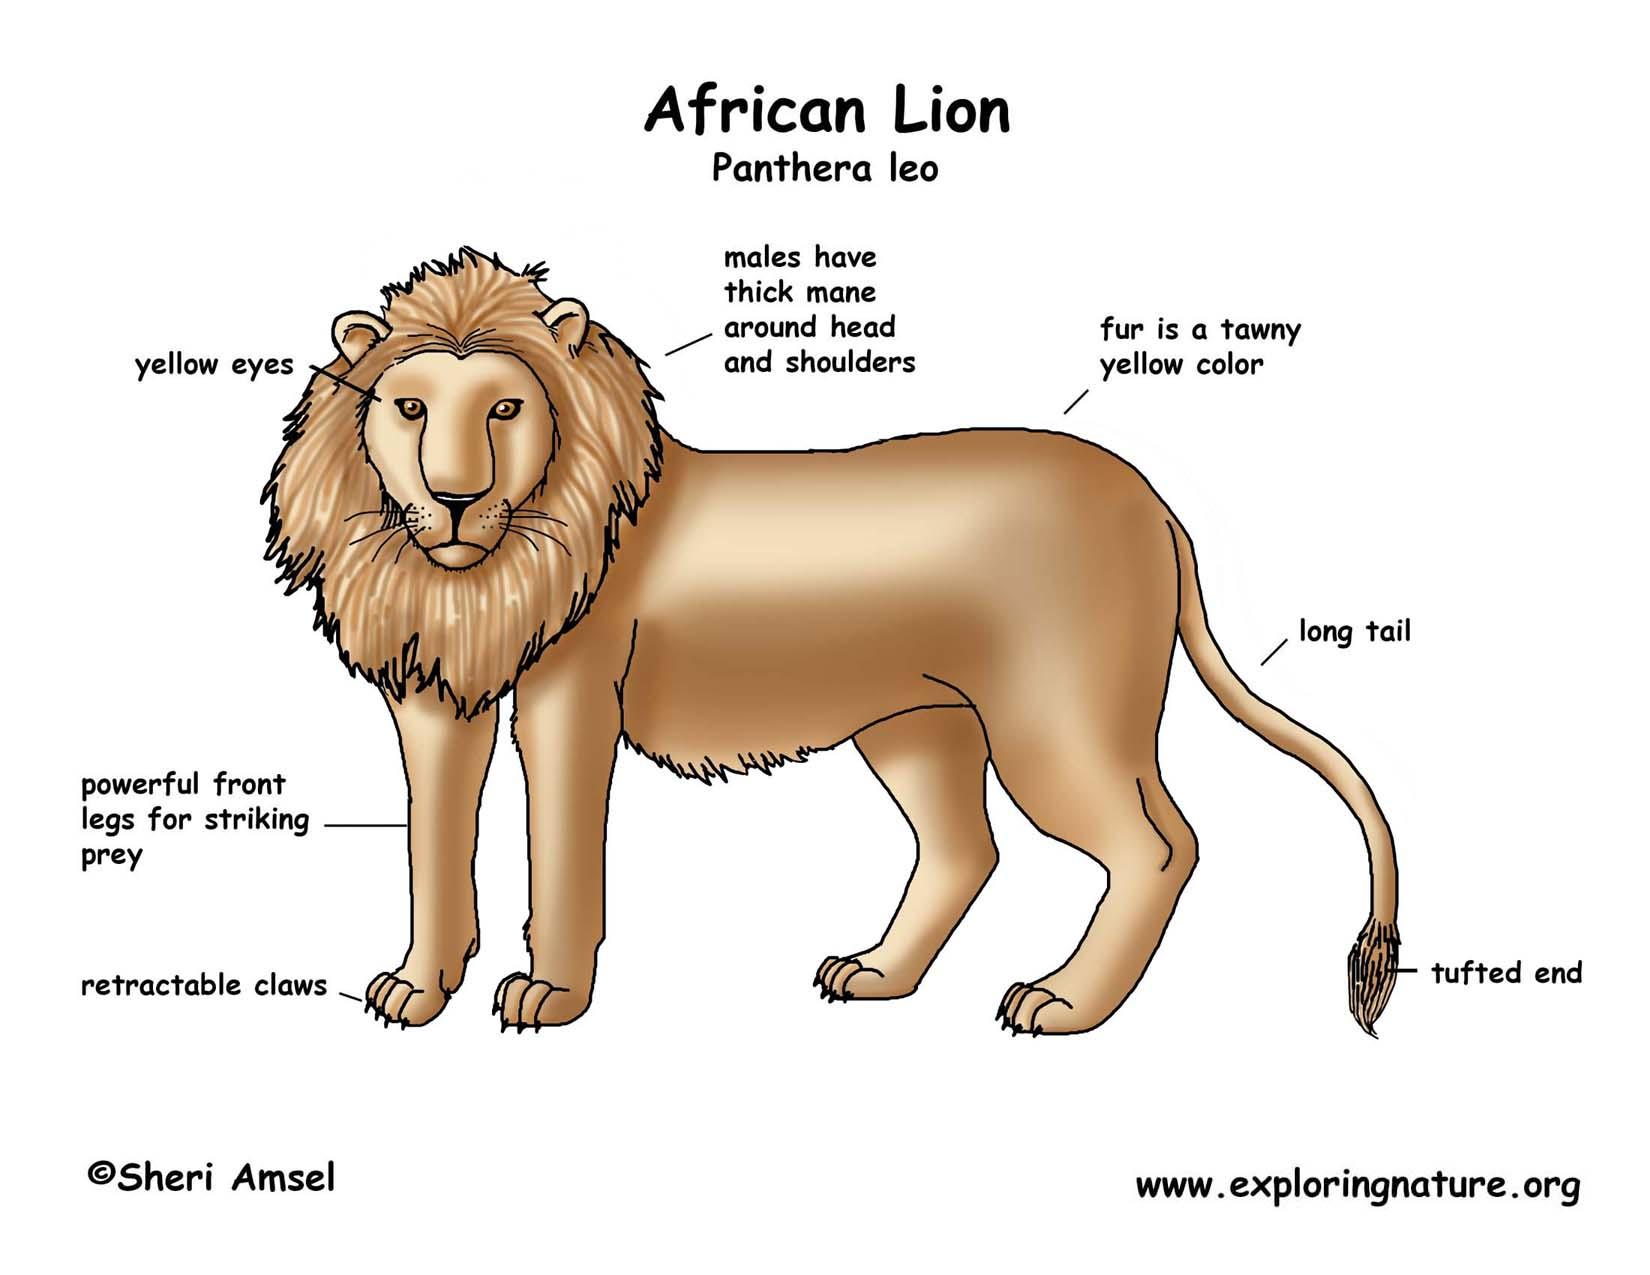 hight resolution of lion african crayfish diagram labeled download hi res color diagram